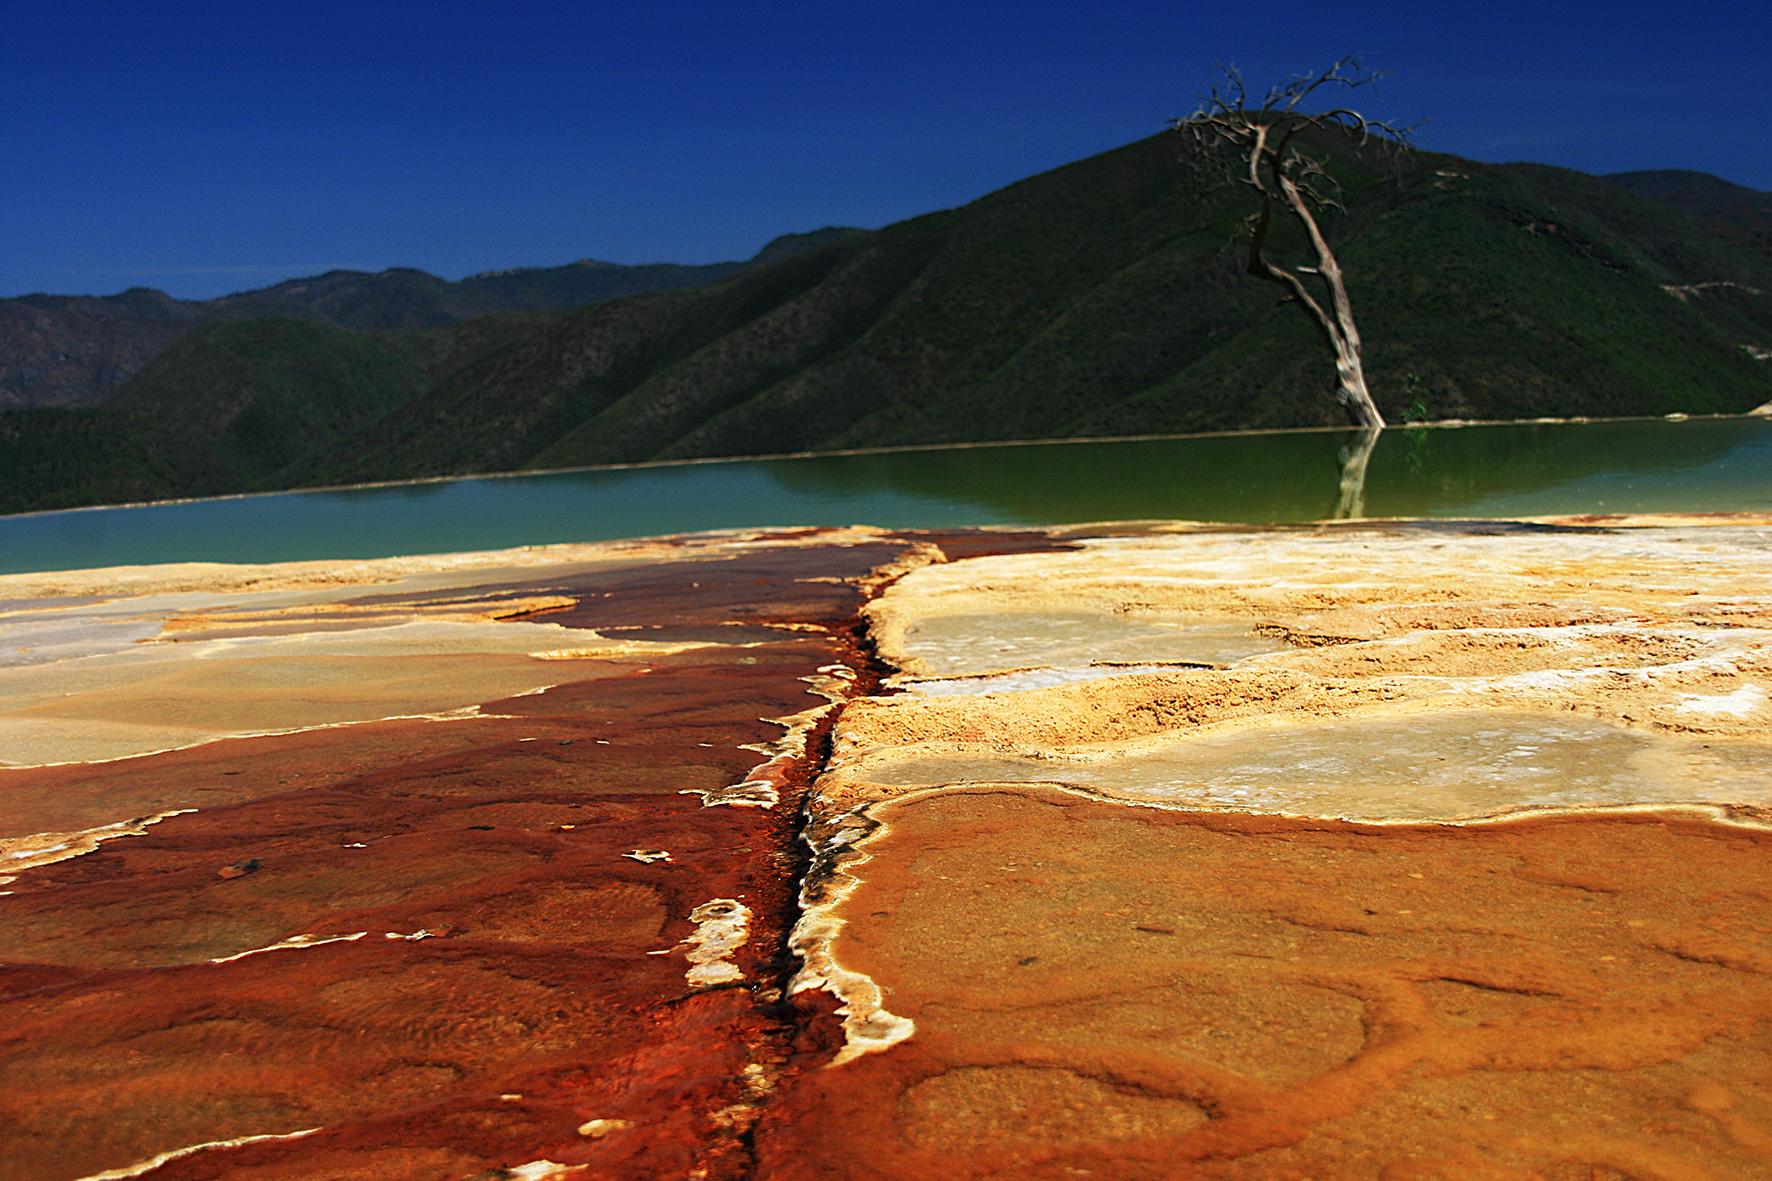 Mexique, Hierve el agua. 2008